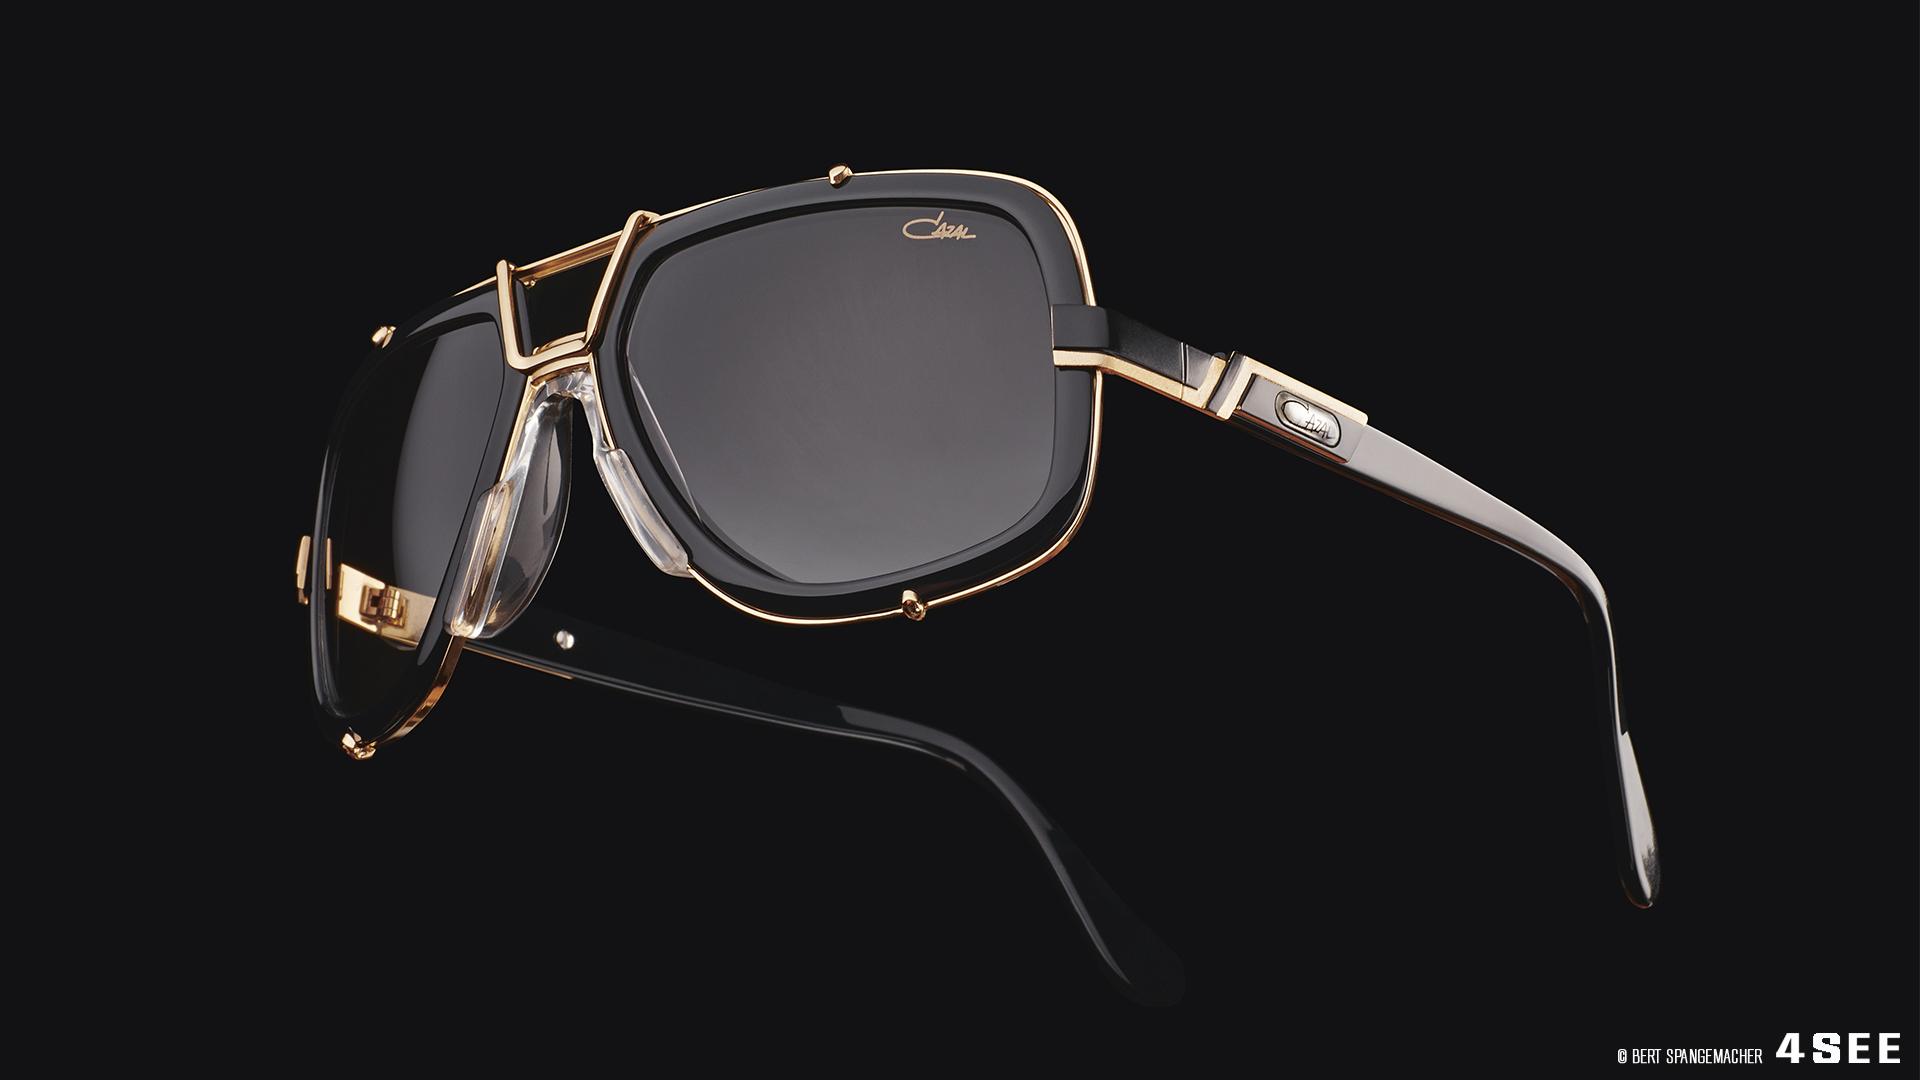 CAZAL LEGENDS 656 001-3 Black with Gold Trim